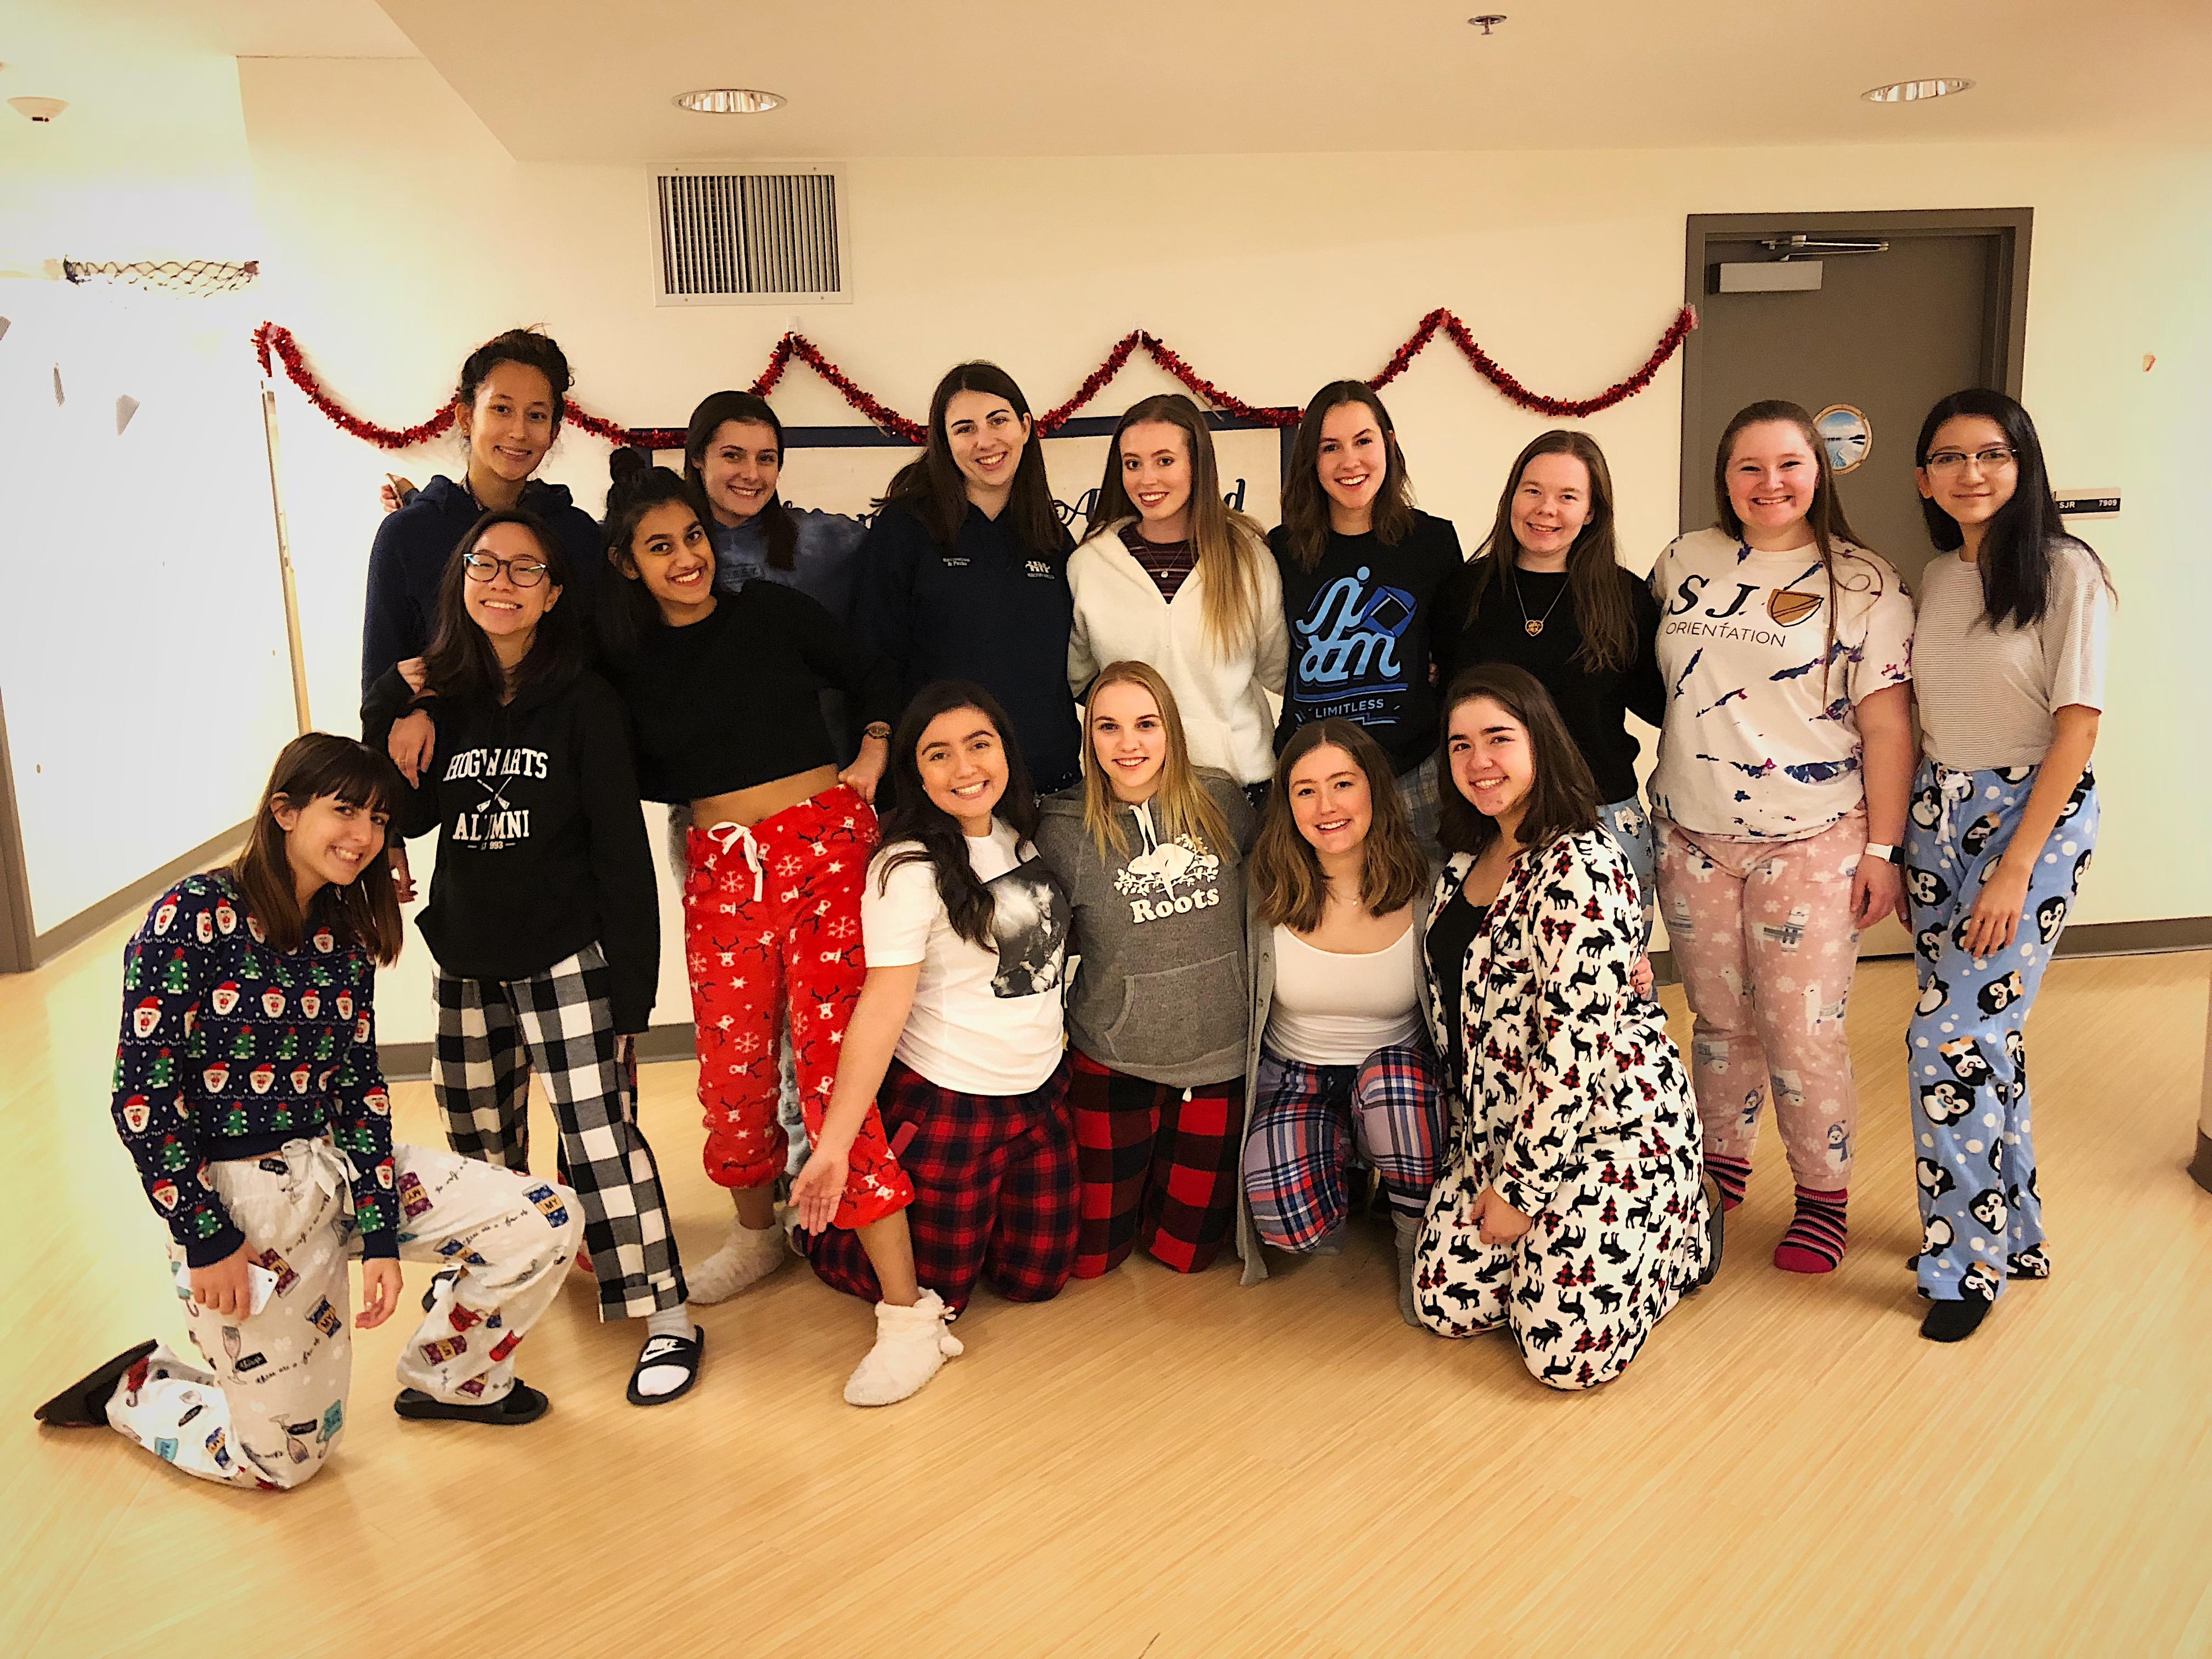 Floor 7 Christmas